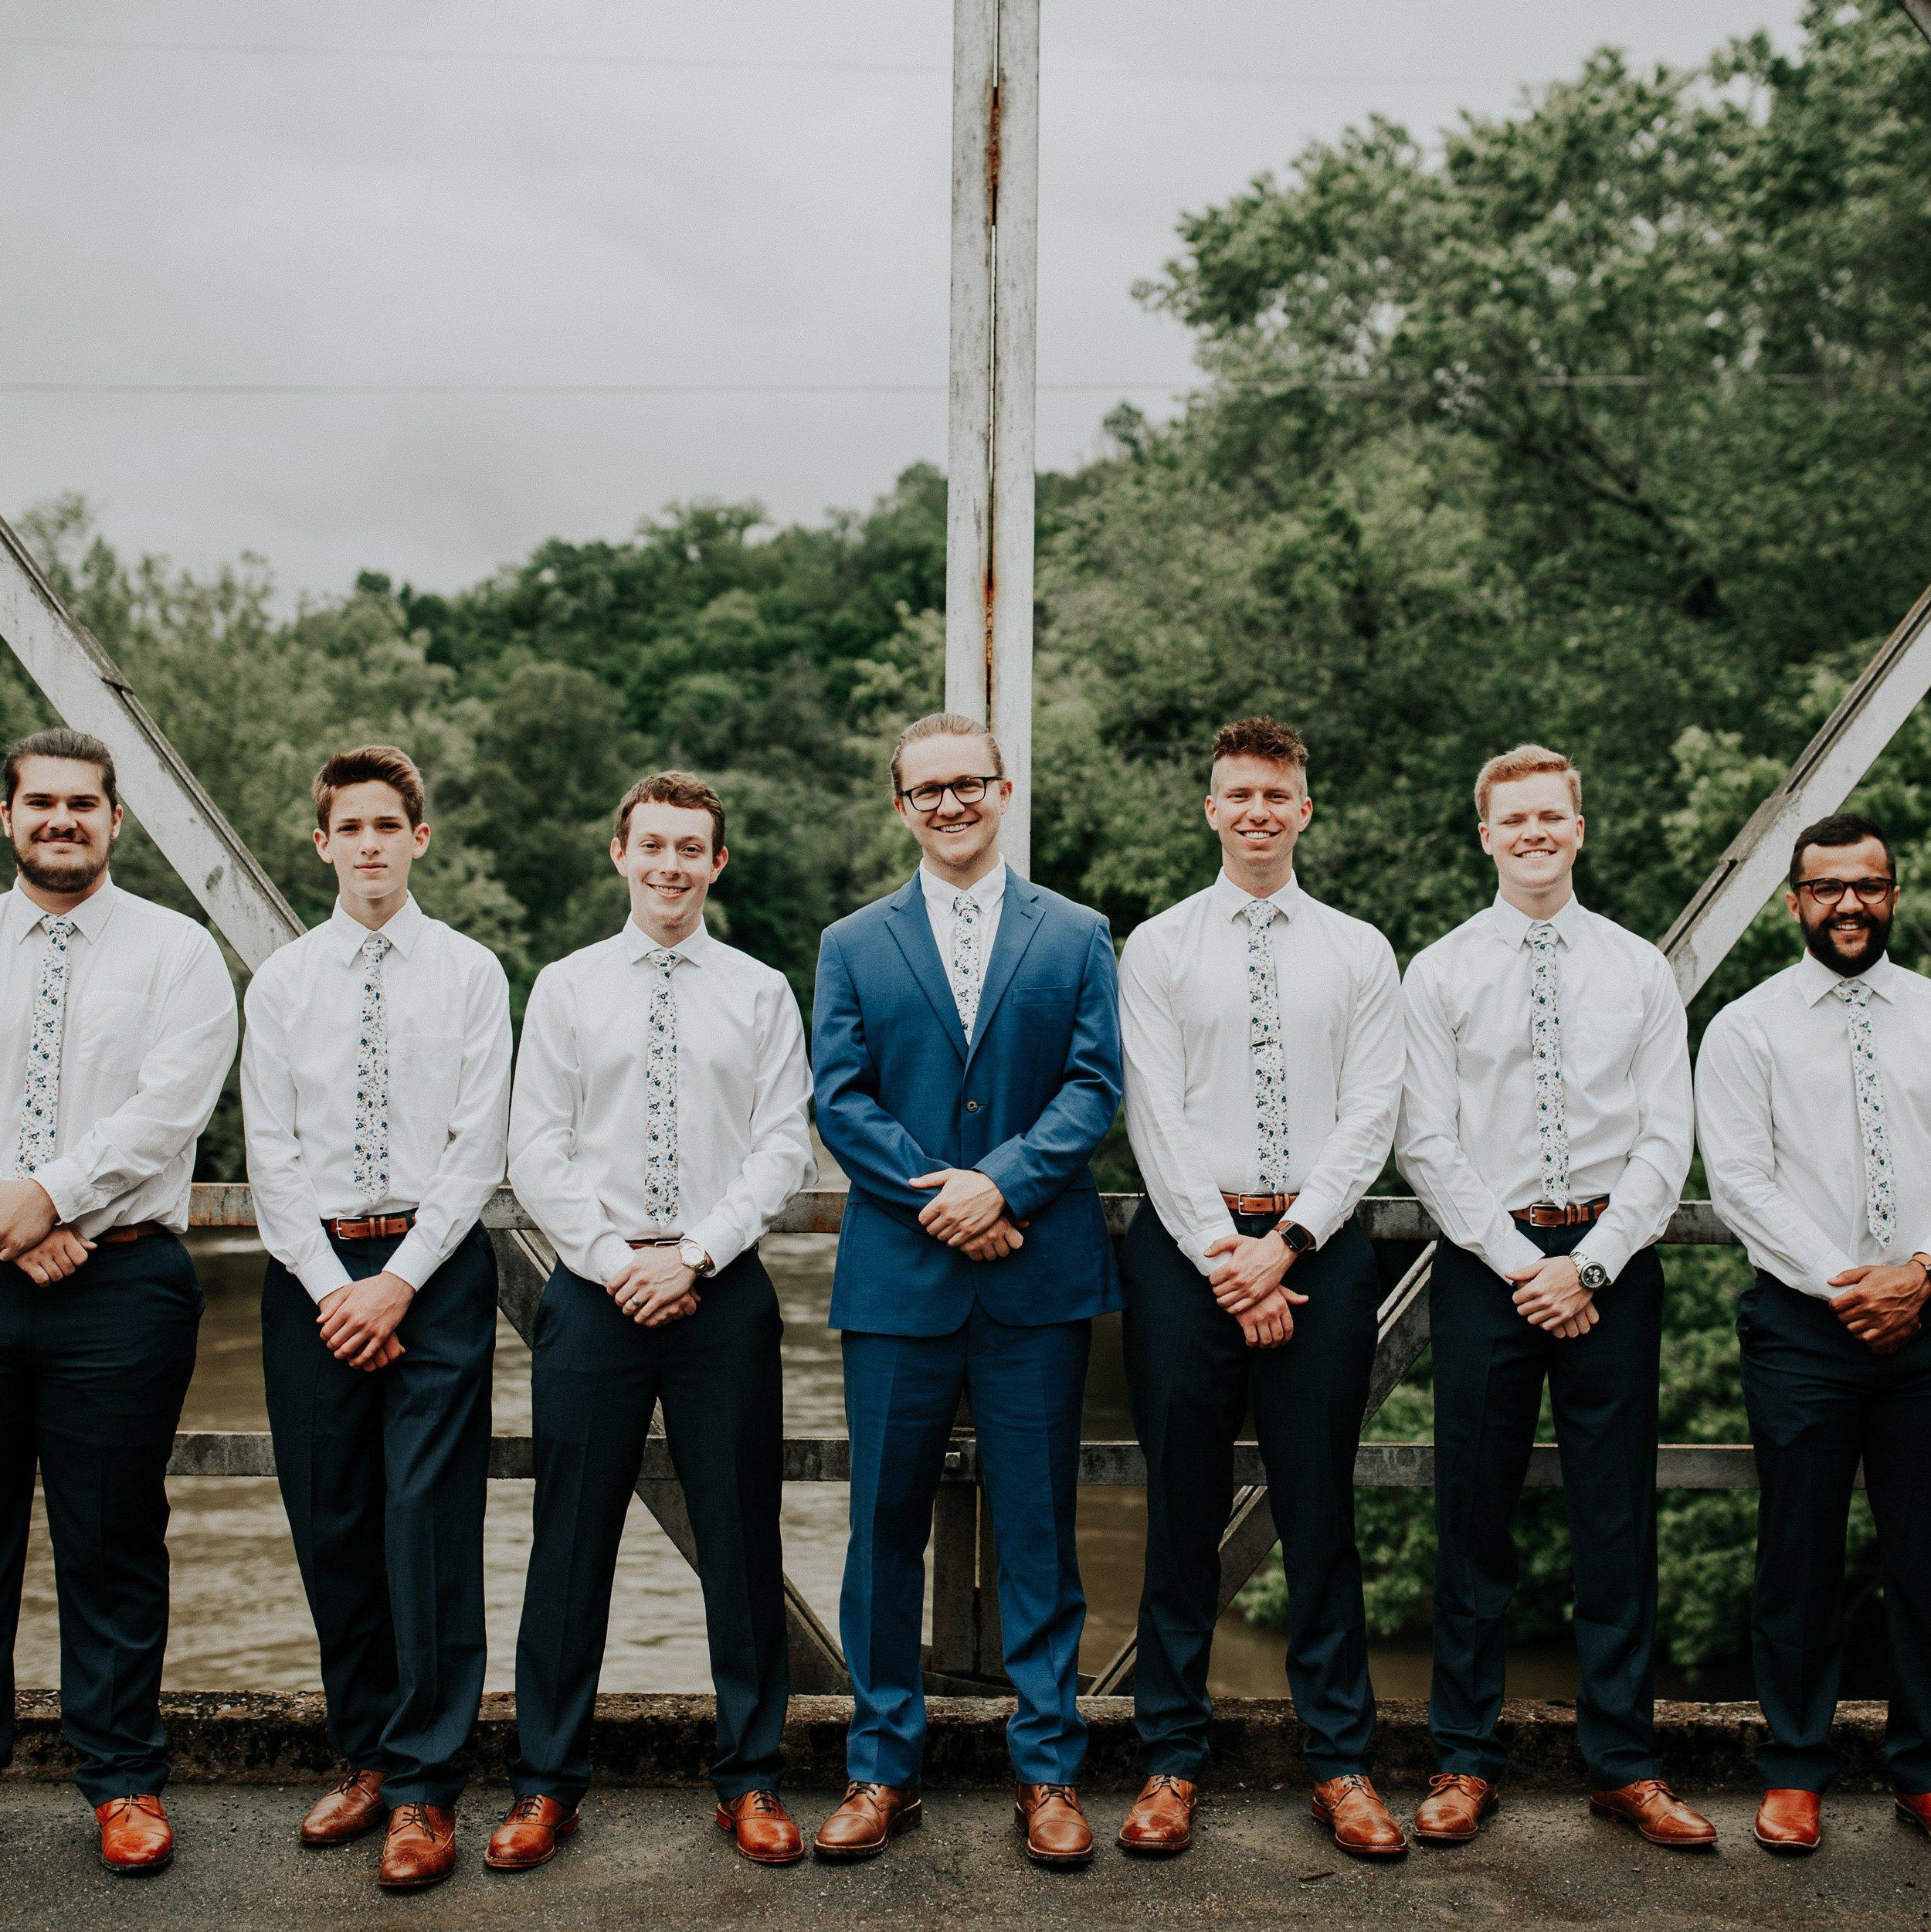 DAZI Men's Skinny Tie Floral Print Cotton Necktie, Great for Weddings, Groom, Groomsmen, Missions, Dances, Gifts. (Blue Bloom) by DAZI (Image #2)